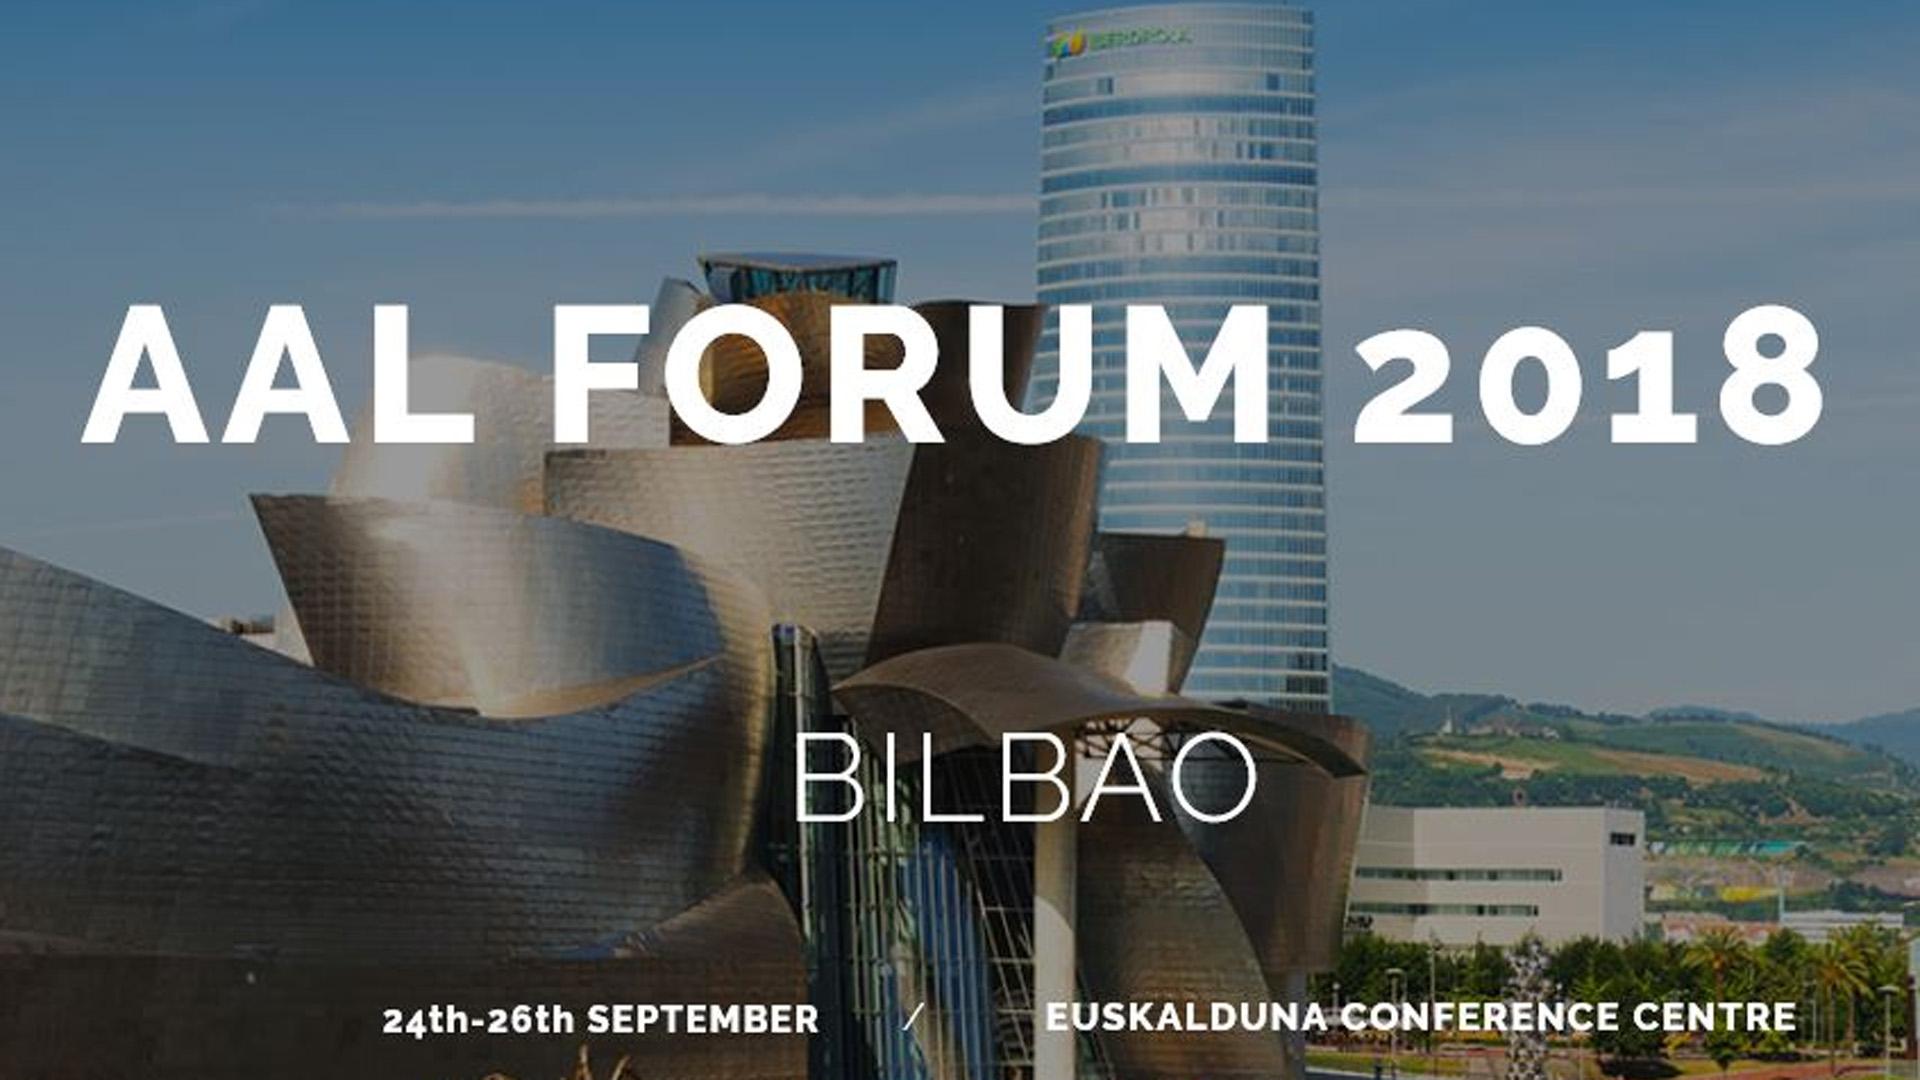 Nagroda Stand Award na AAL Forum 2018 w Bilbao dla projektu PaletteV2